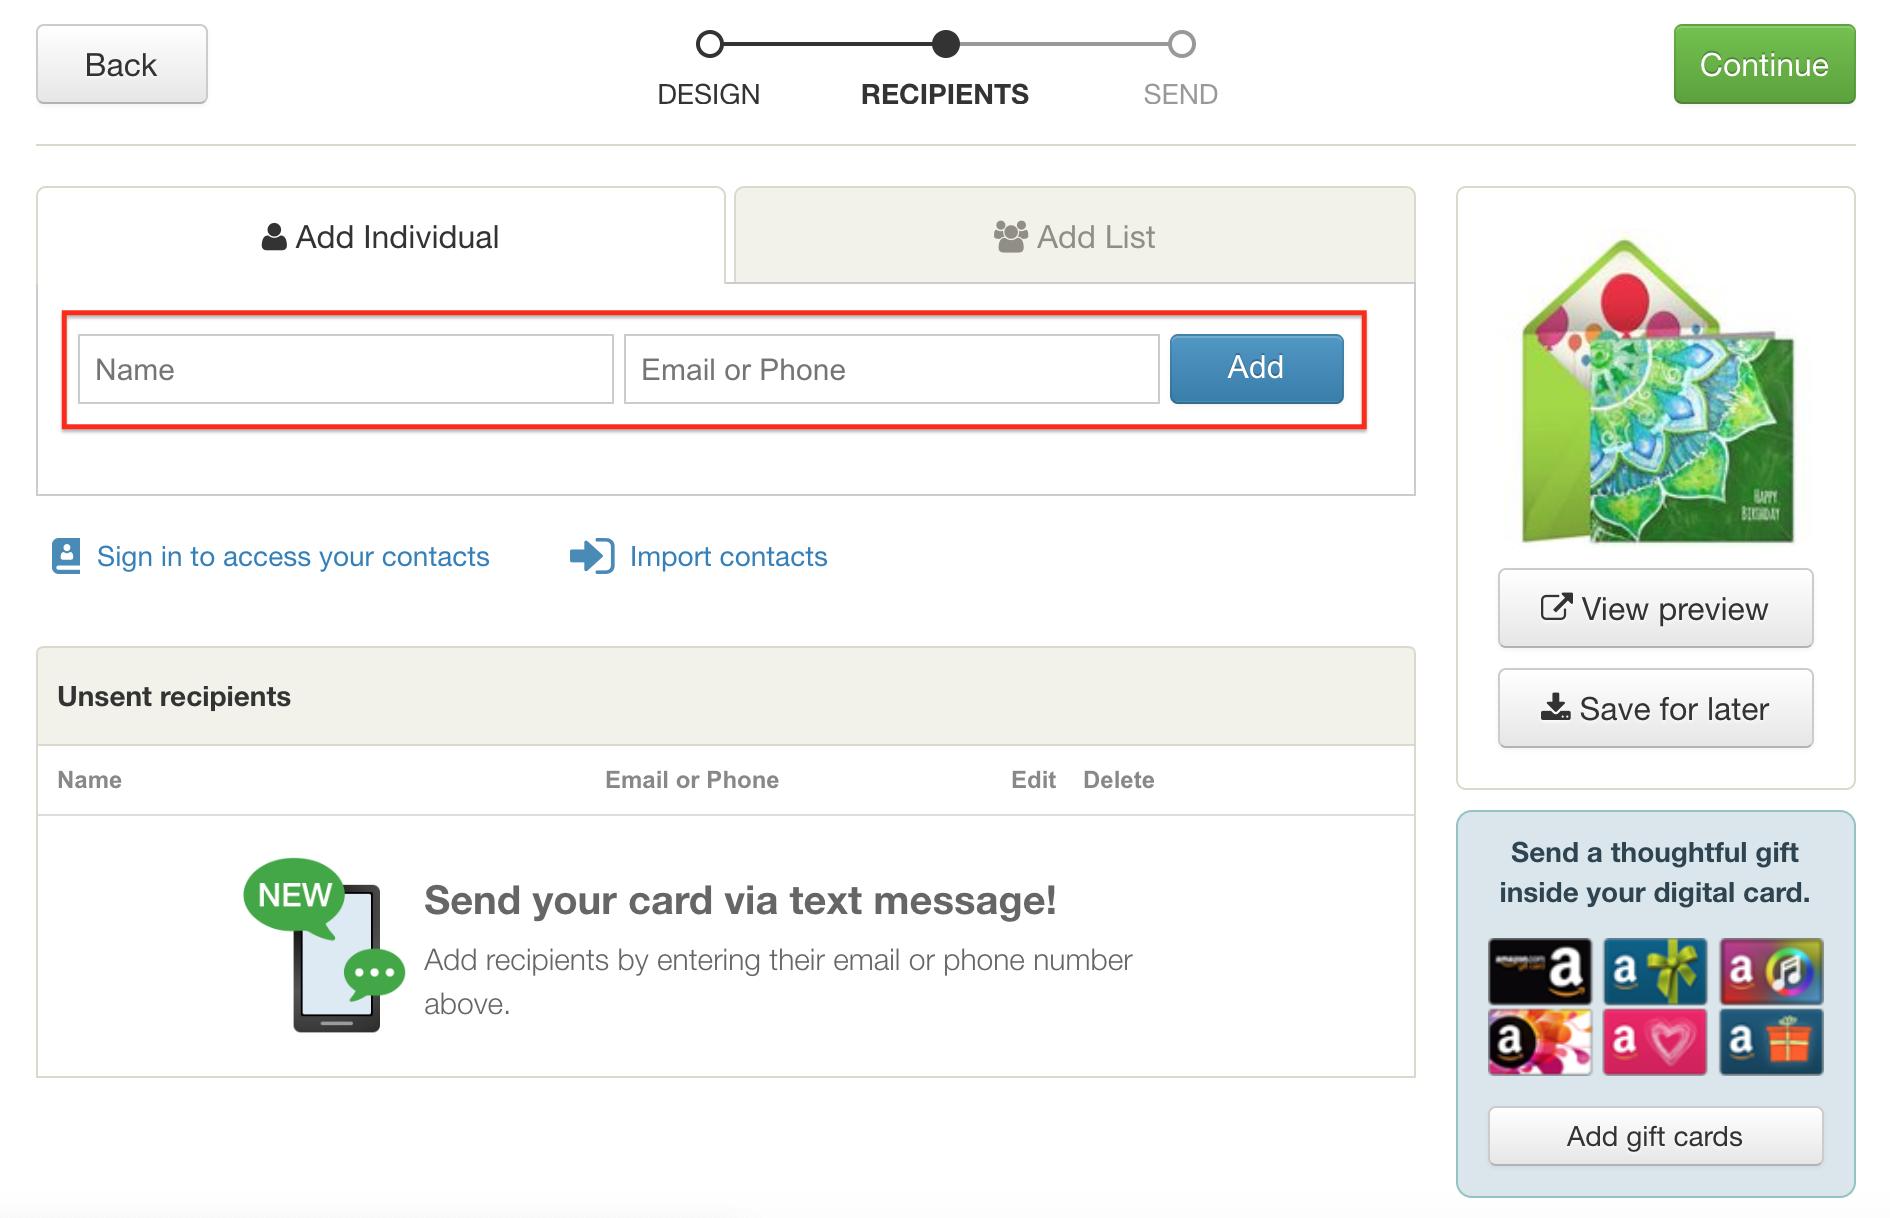 Can I Send A Digital Card Through Text Message